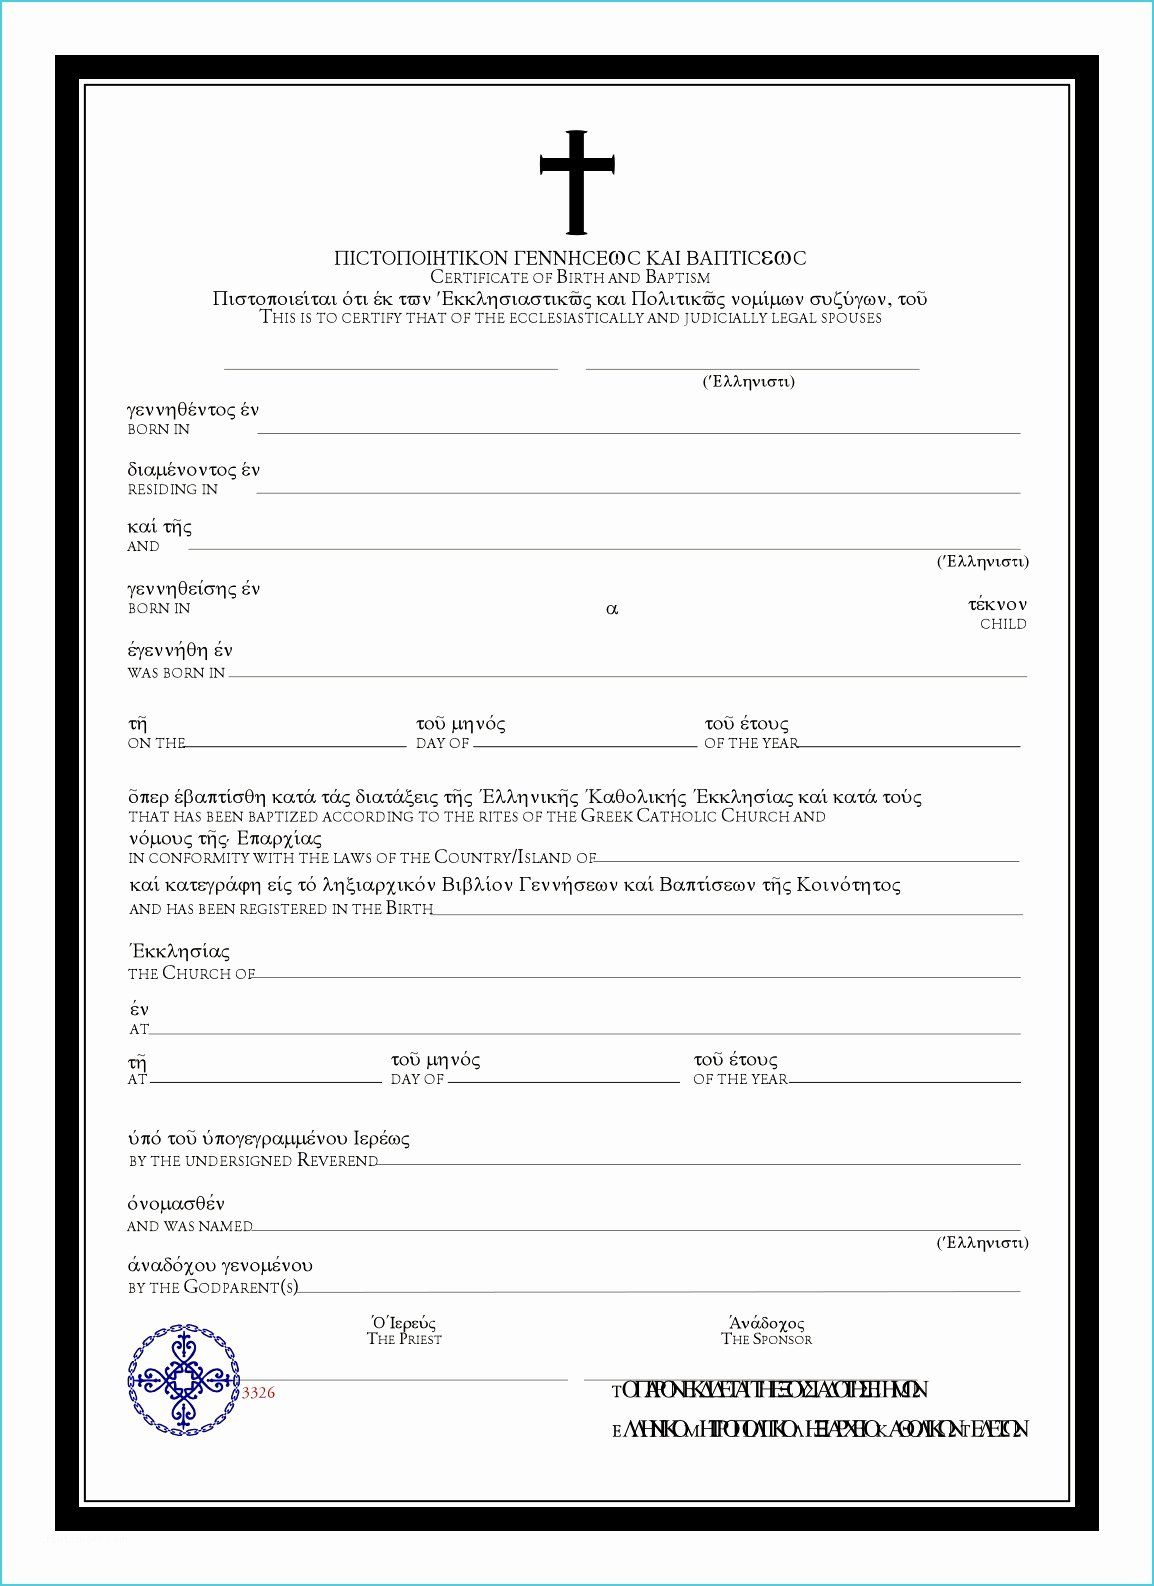 Certificate Of Baptism Word Template Beautiful Baptism Certificate Template Publisher Download Christening Word Template Certificate Template Templates Microsoft word baptism certificate template